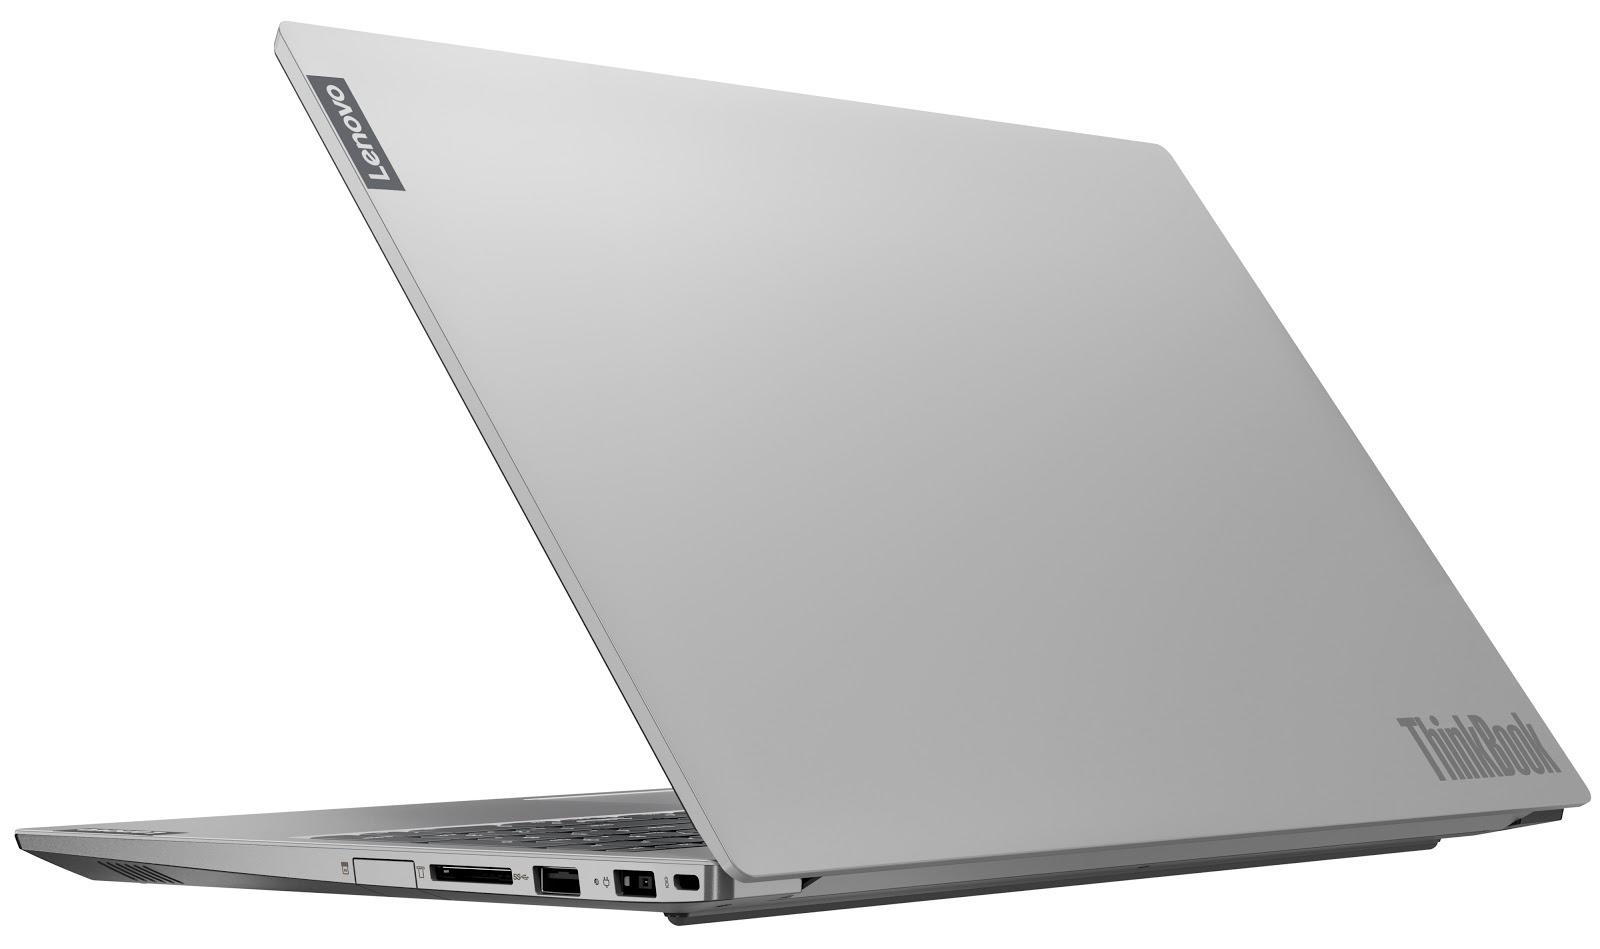 Фото 1. Ноутбук Lenovo ThinkBook 15-IIL (20SM0030RU)